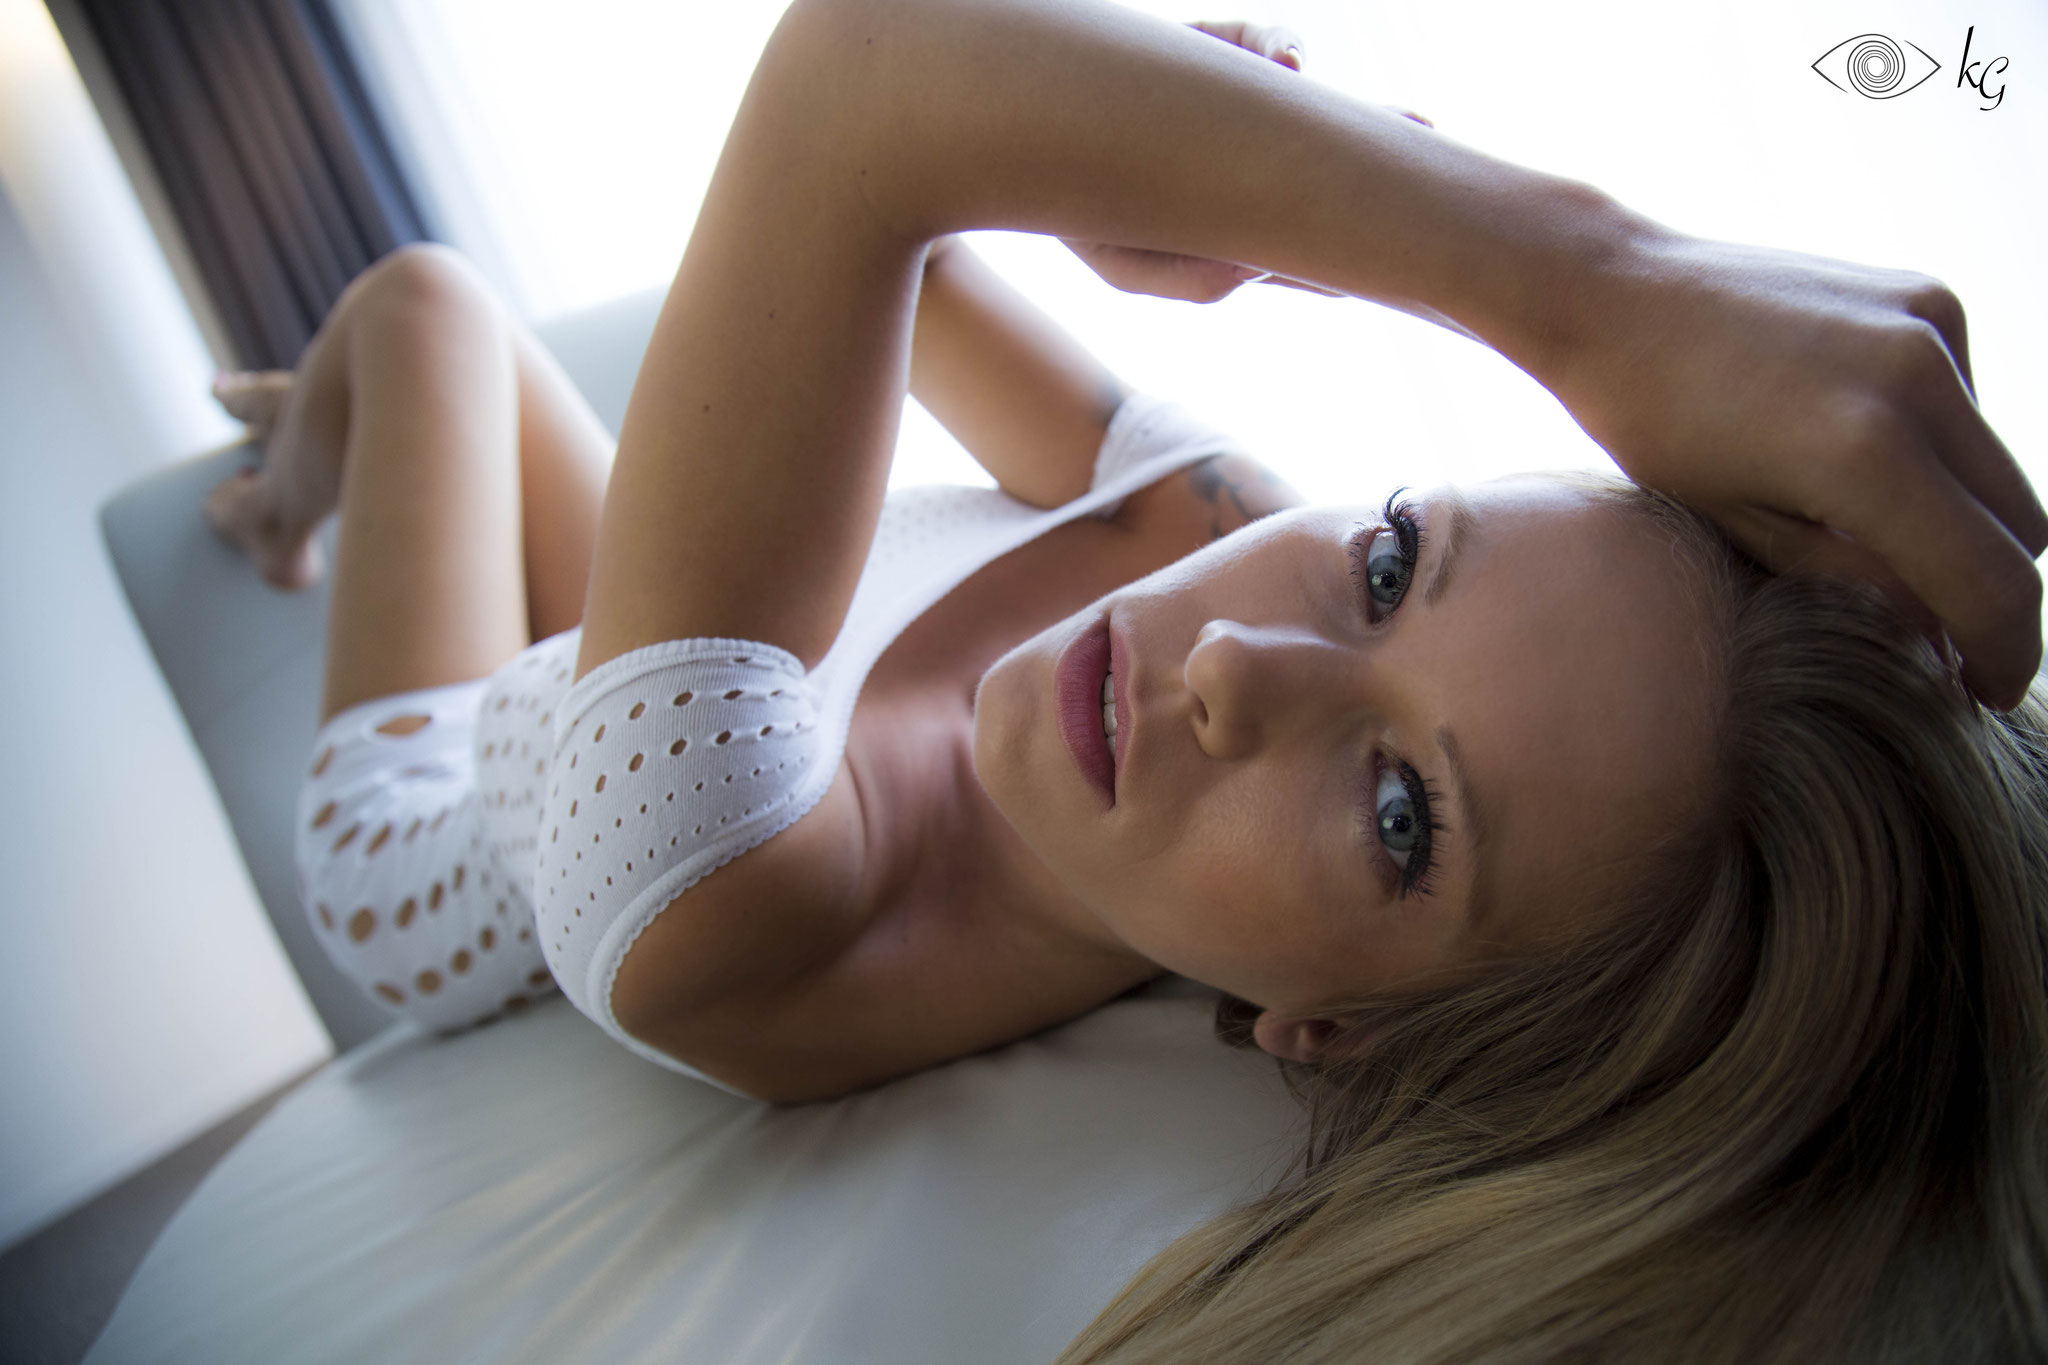 Dominika (professional Model)